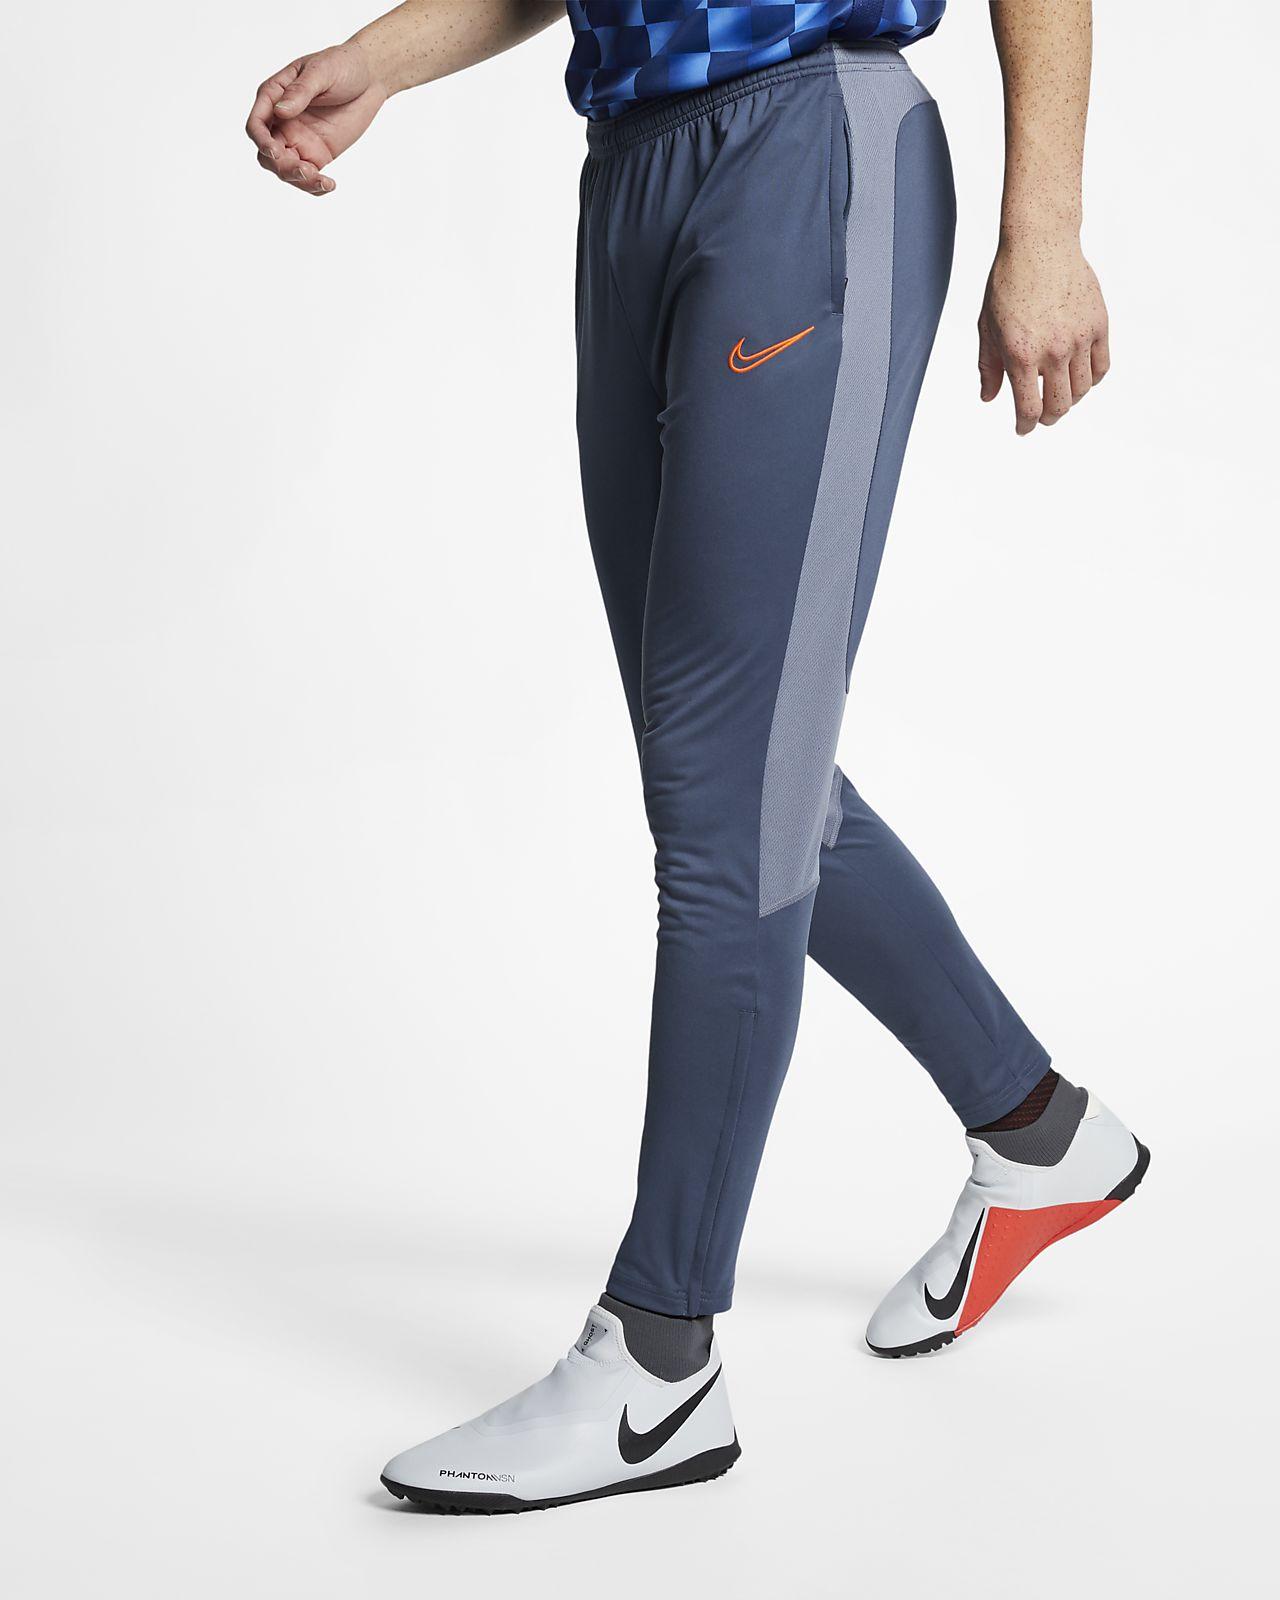 Nike Dri-FIT Academy Erkek Futbol Eşofman Altı